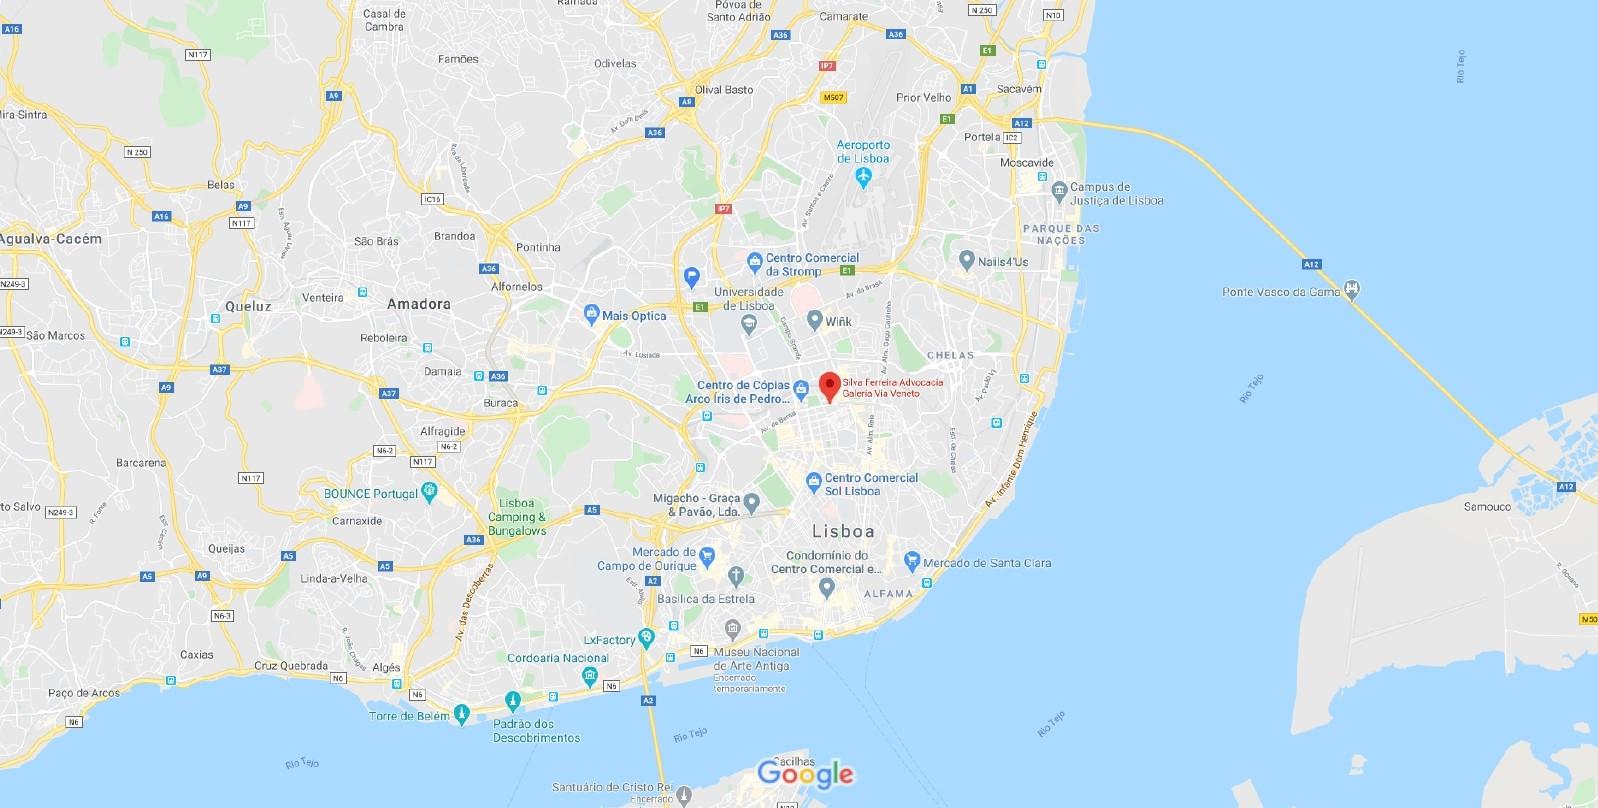 Galeria Via Veneto - Google Maps_page-0001 (1) 2